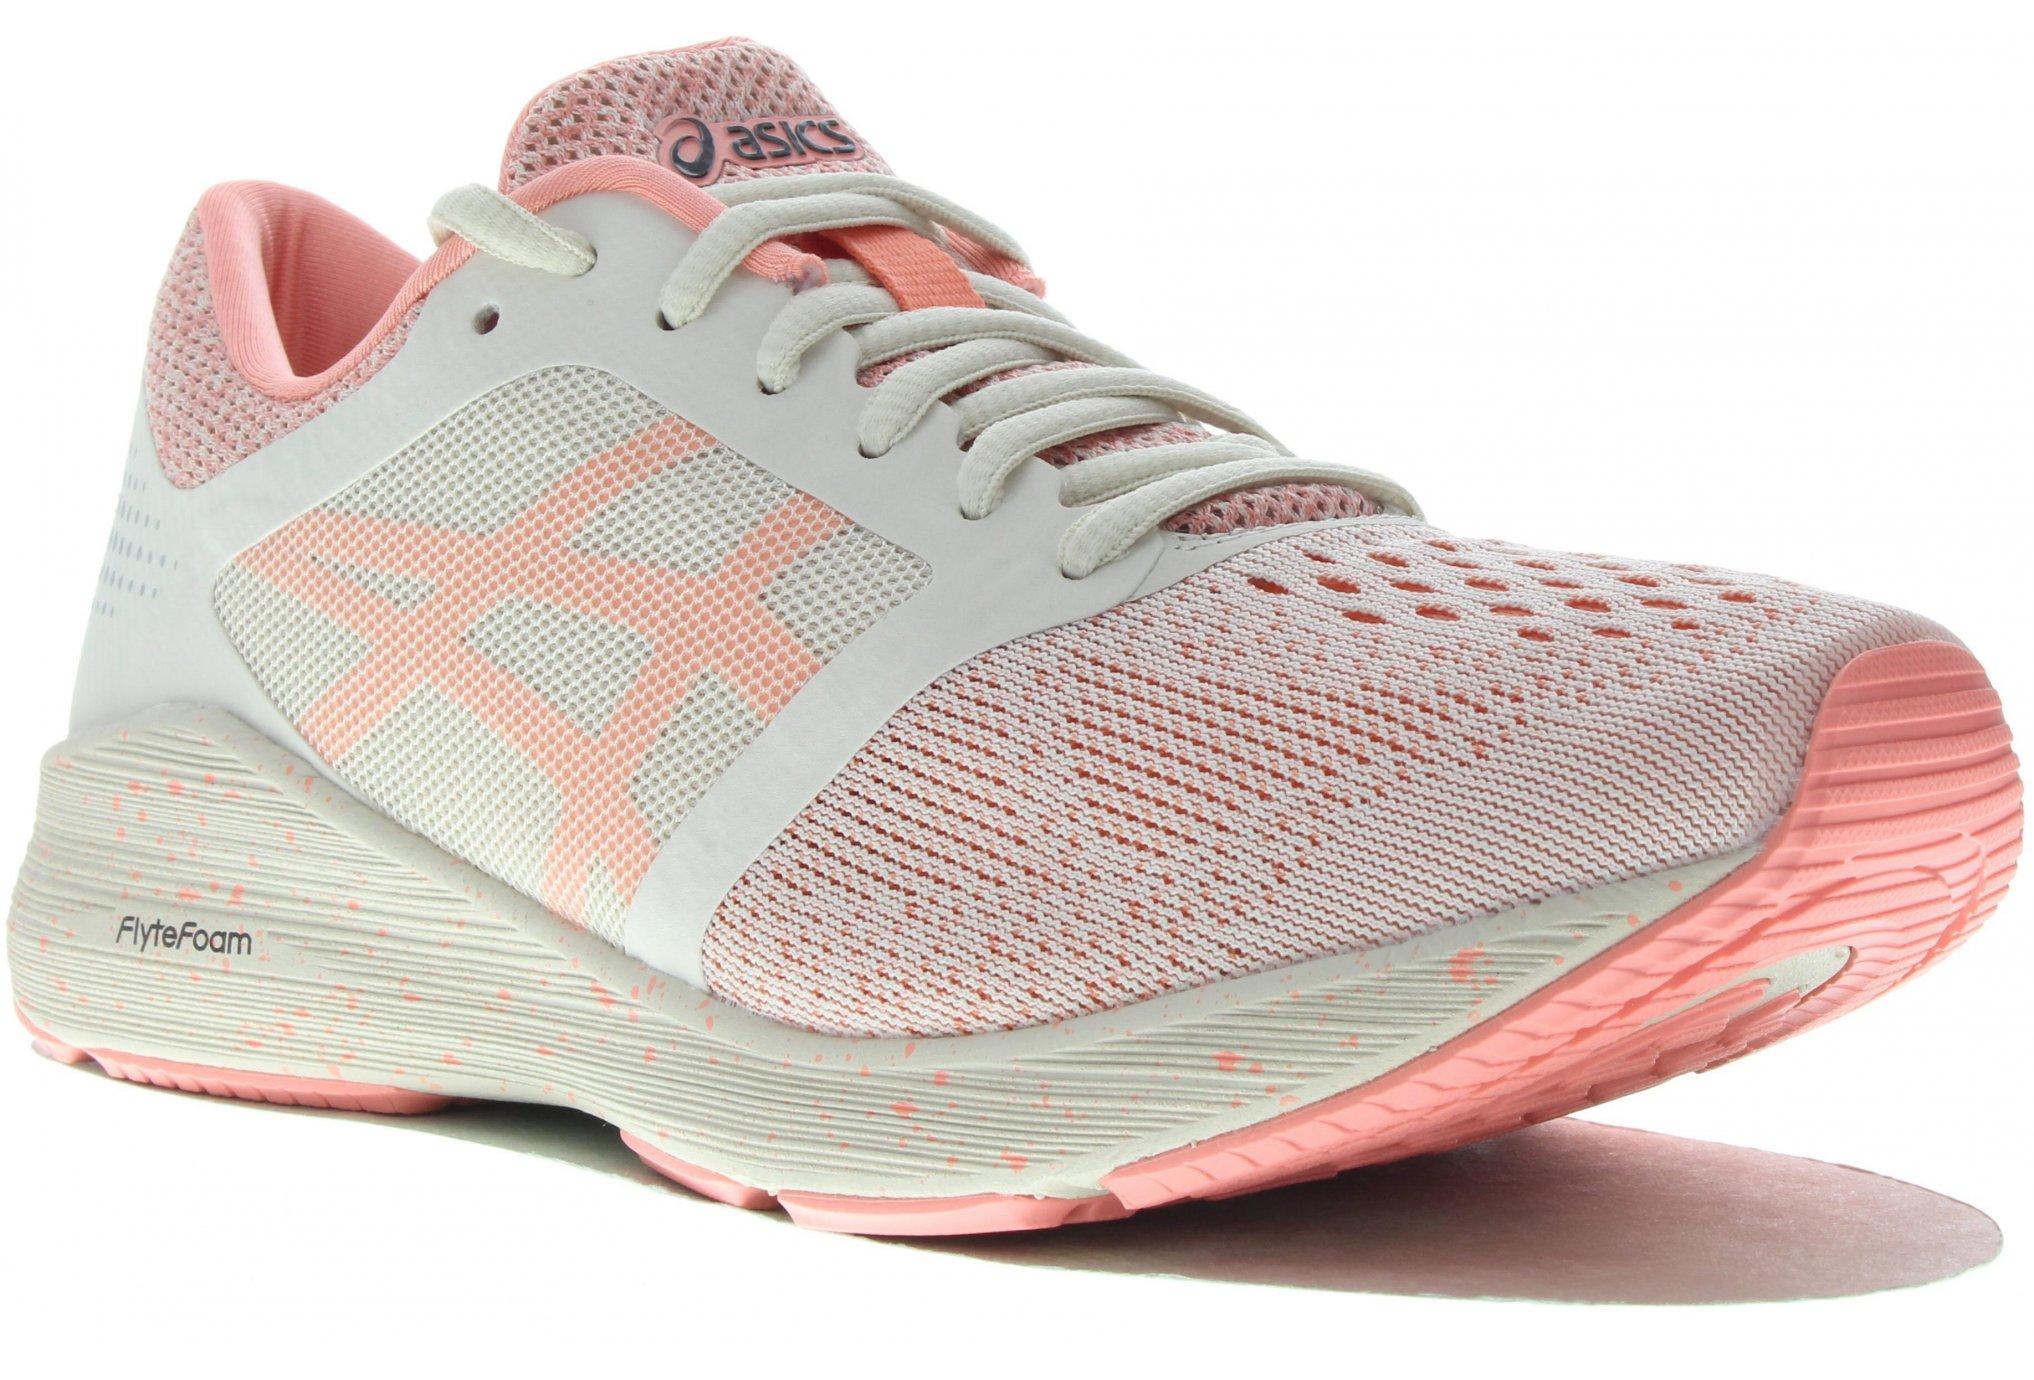 Asics RoadHawk FF Sakura Chaussures running femme